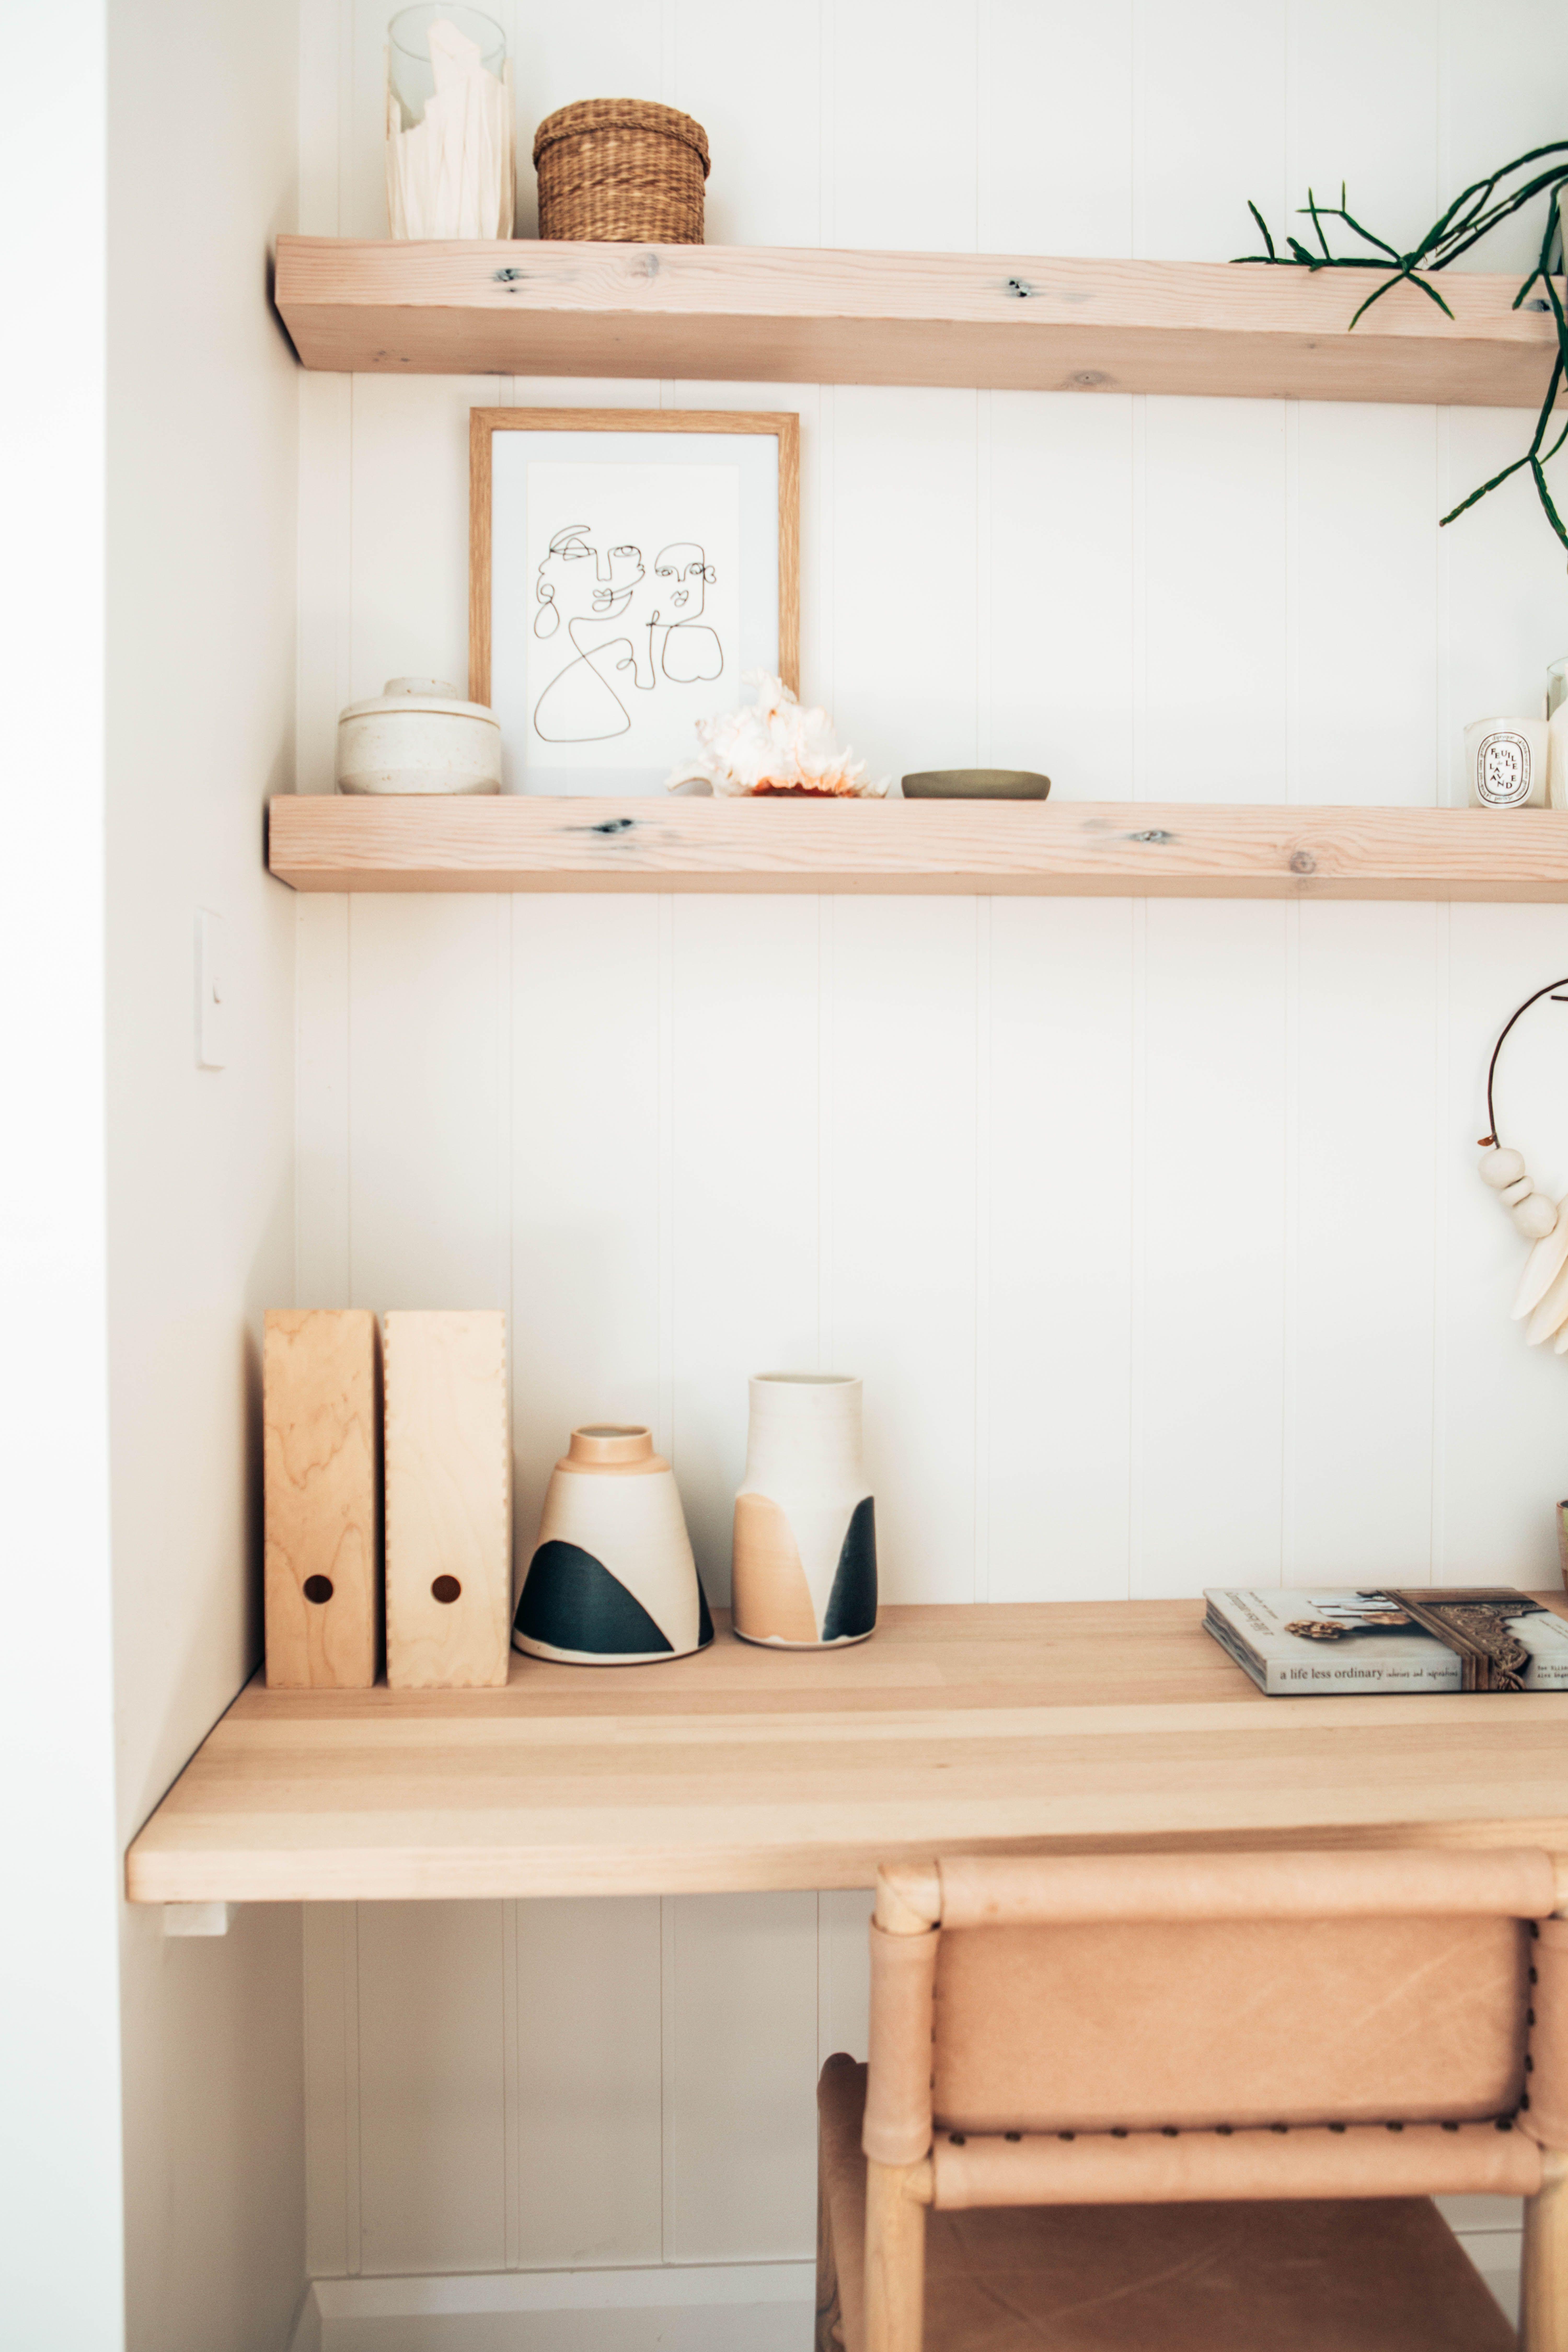 Episode 5 study nook complete workspace inspiration